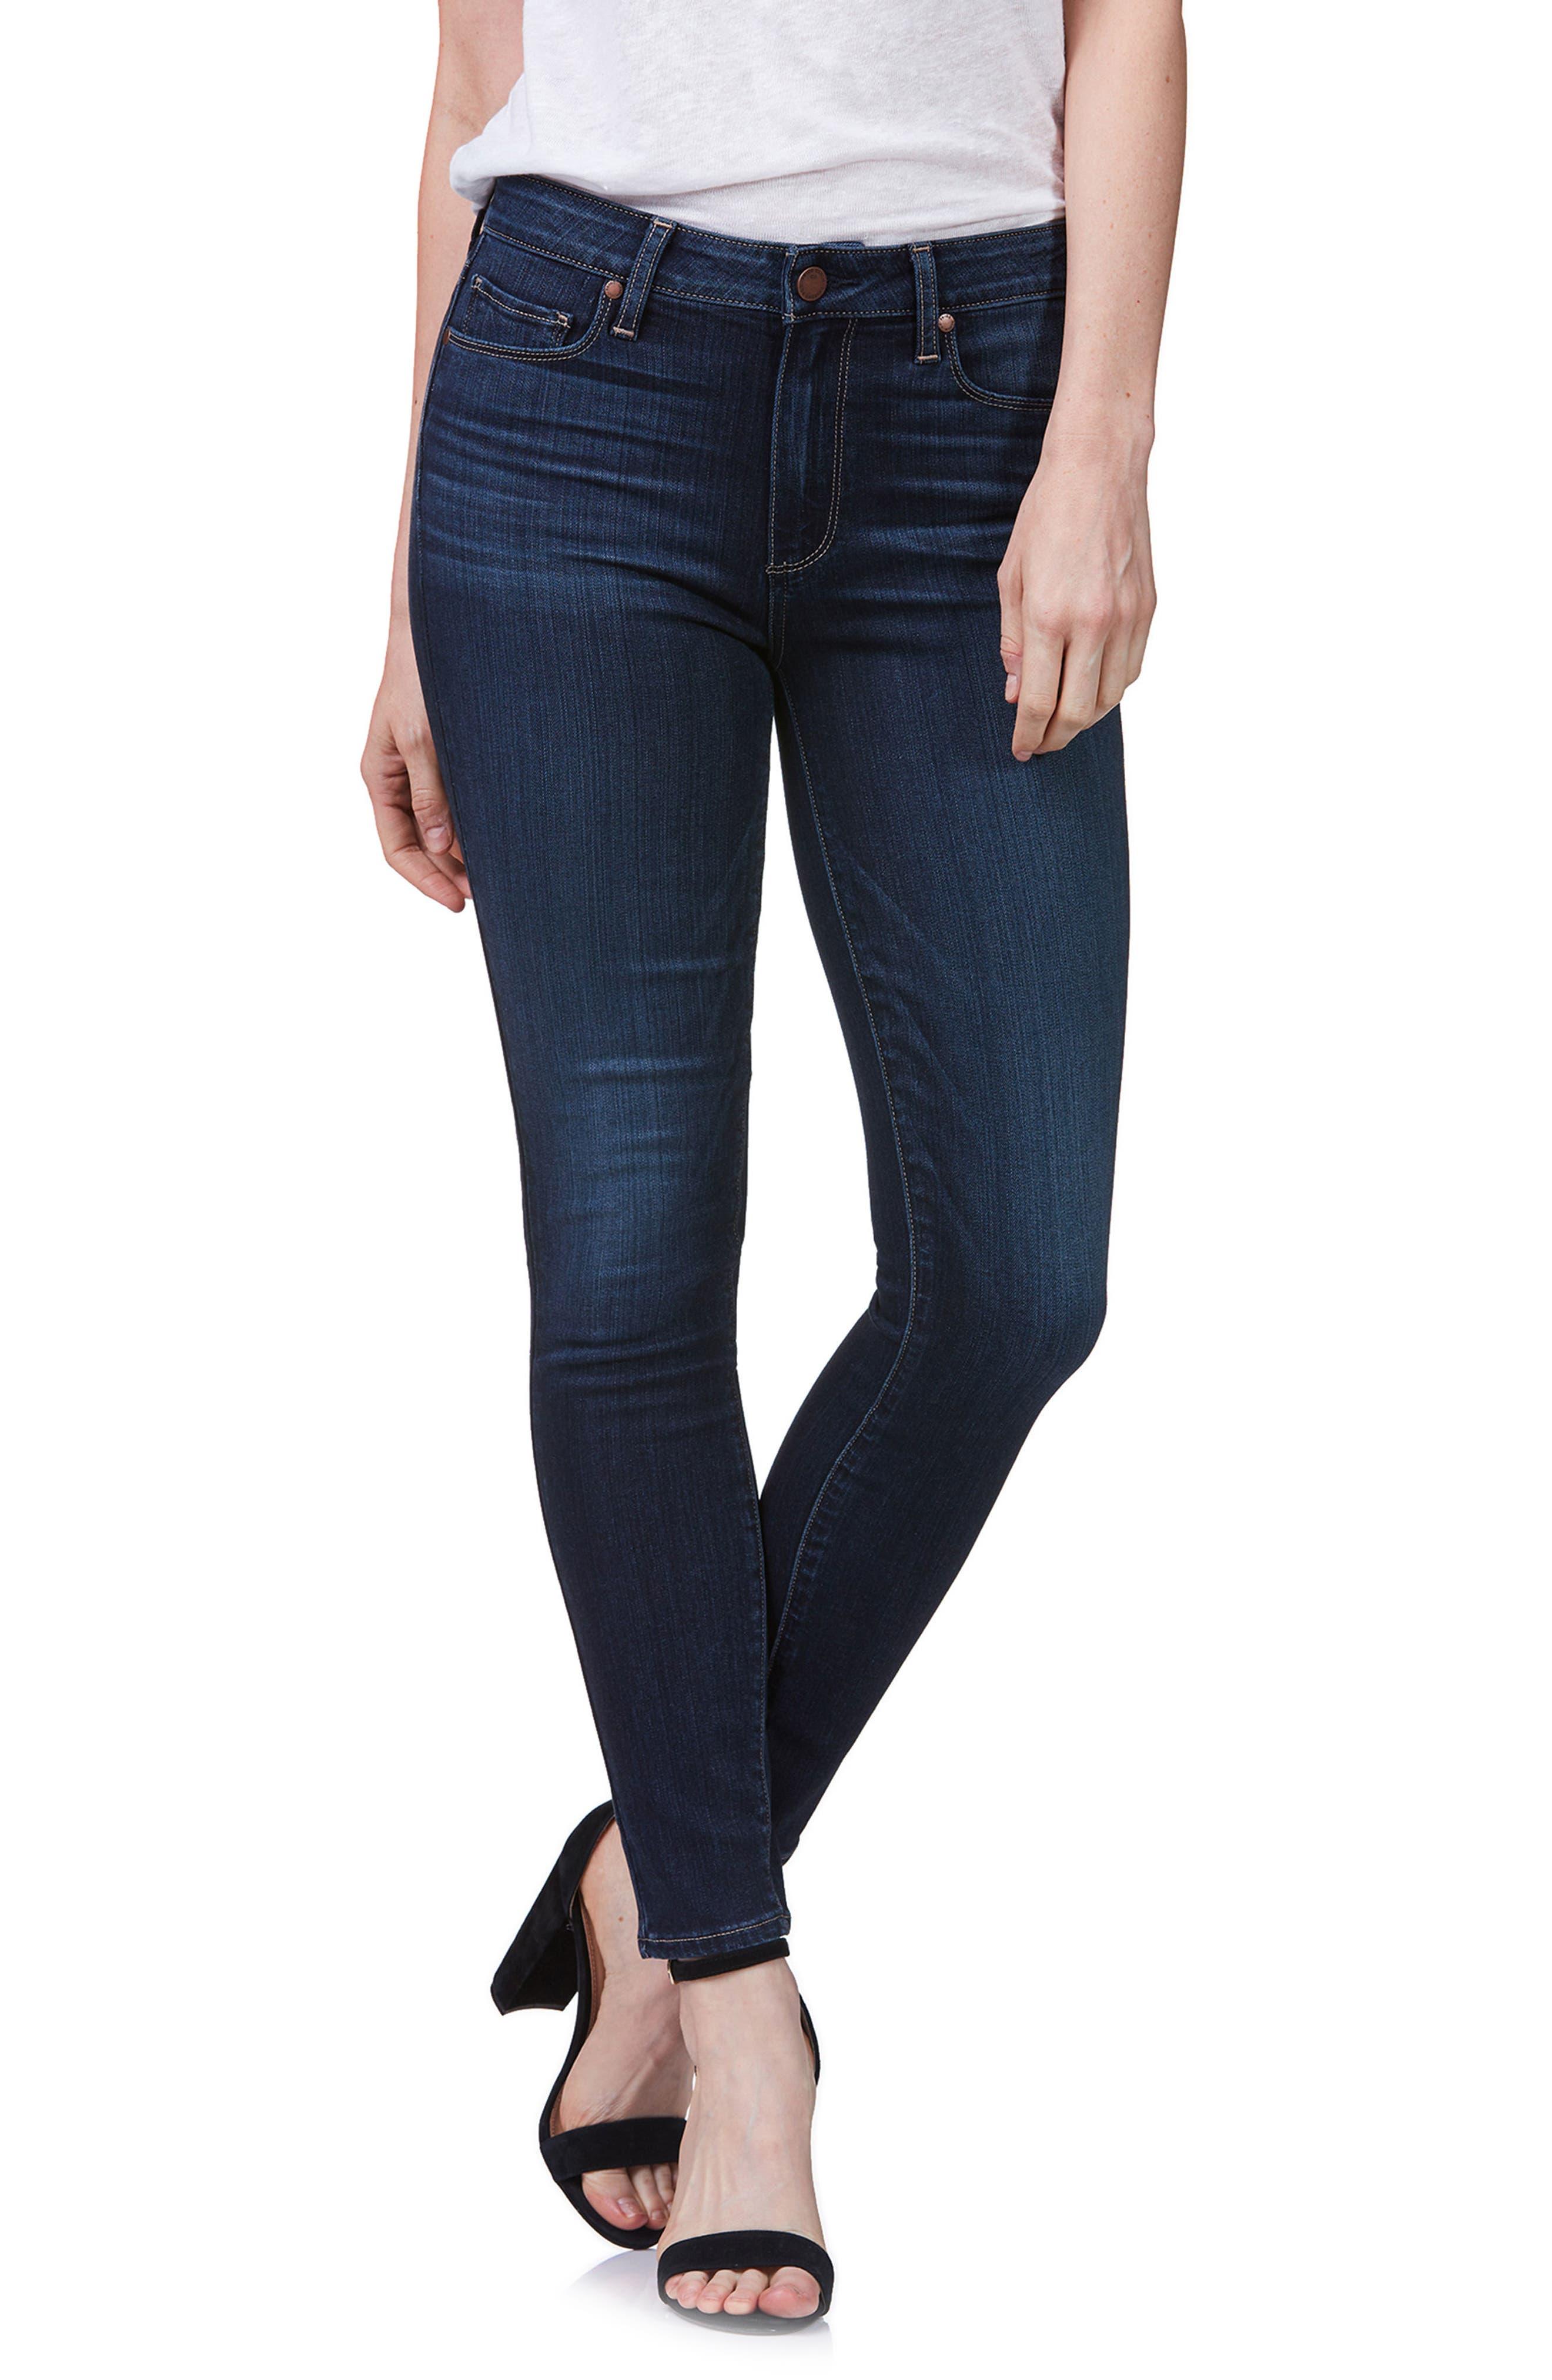 Hoxton High Waist Ultra Skinny Jeans,                             Main thumbnail 1, color,                             400